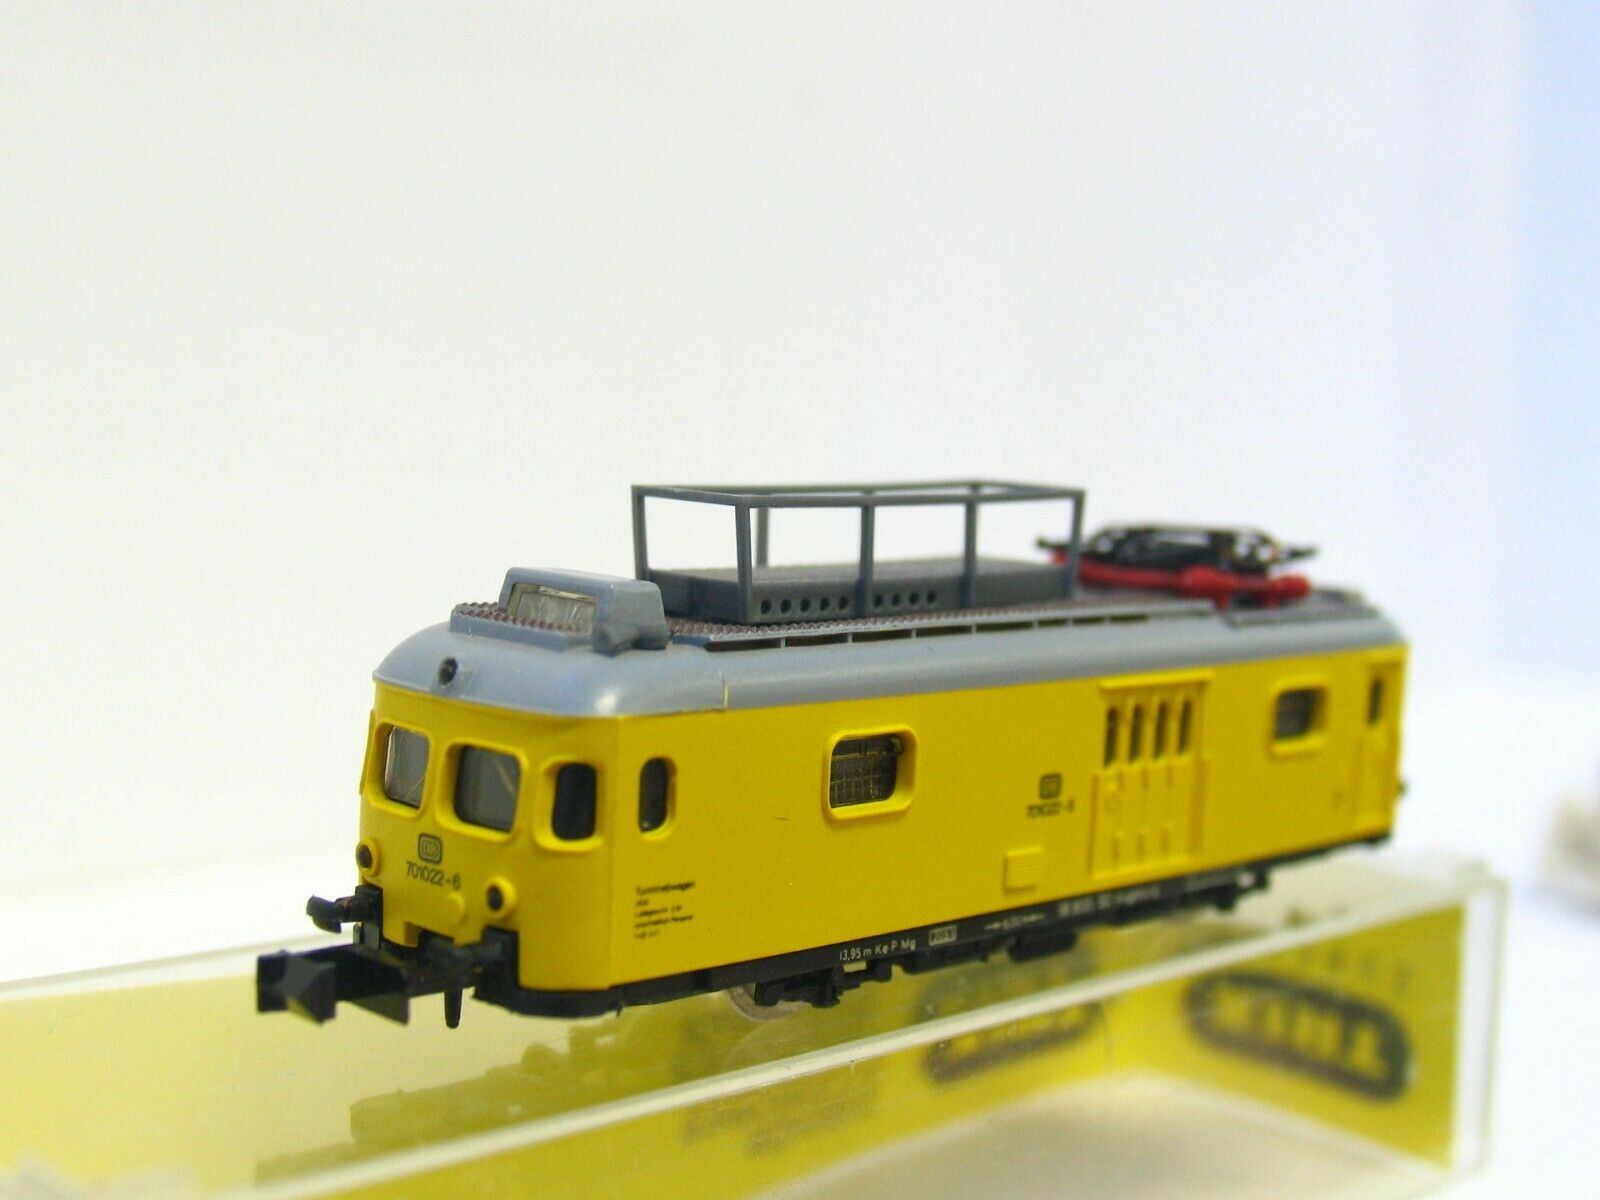 Arnold N Tower Railcar BR 701022-6 DB VP (RB6502)